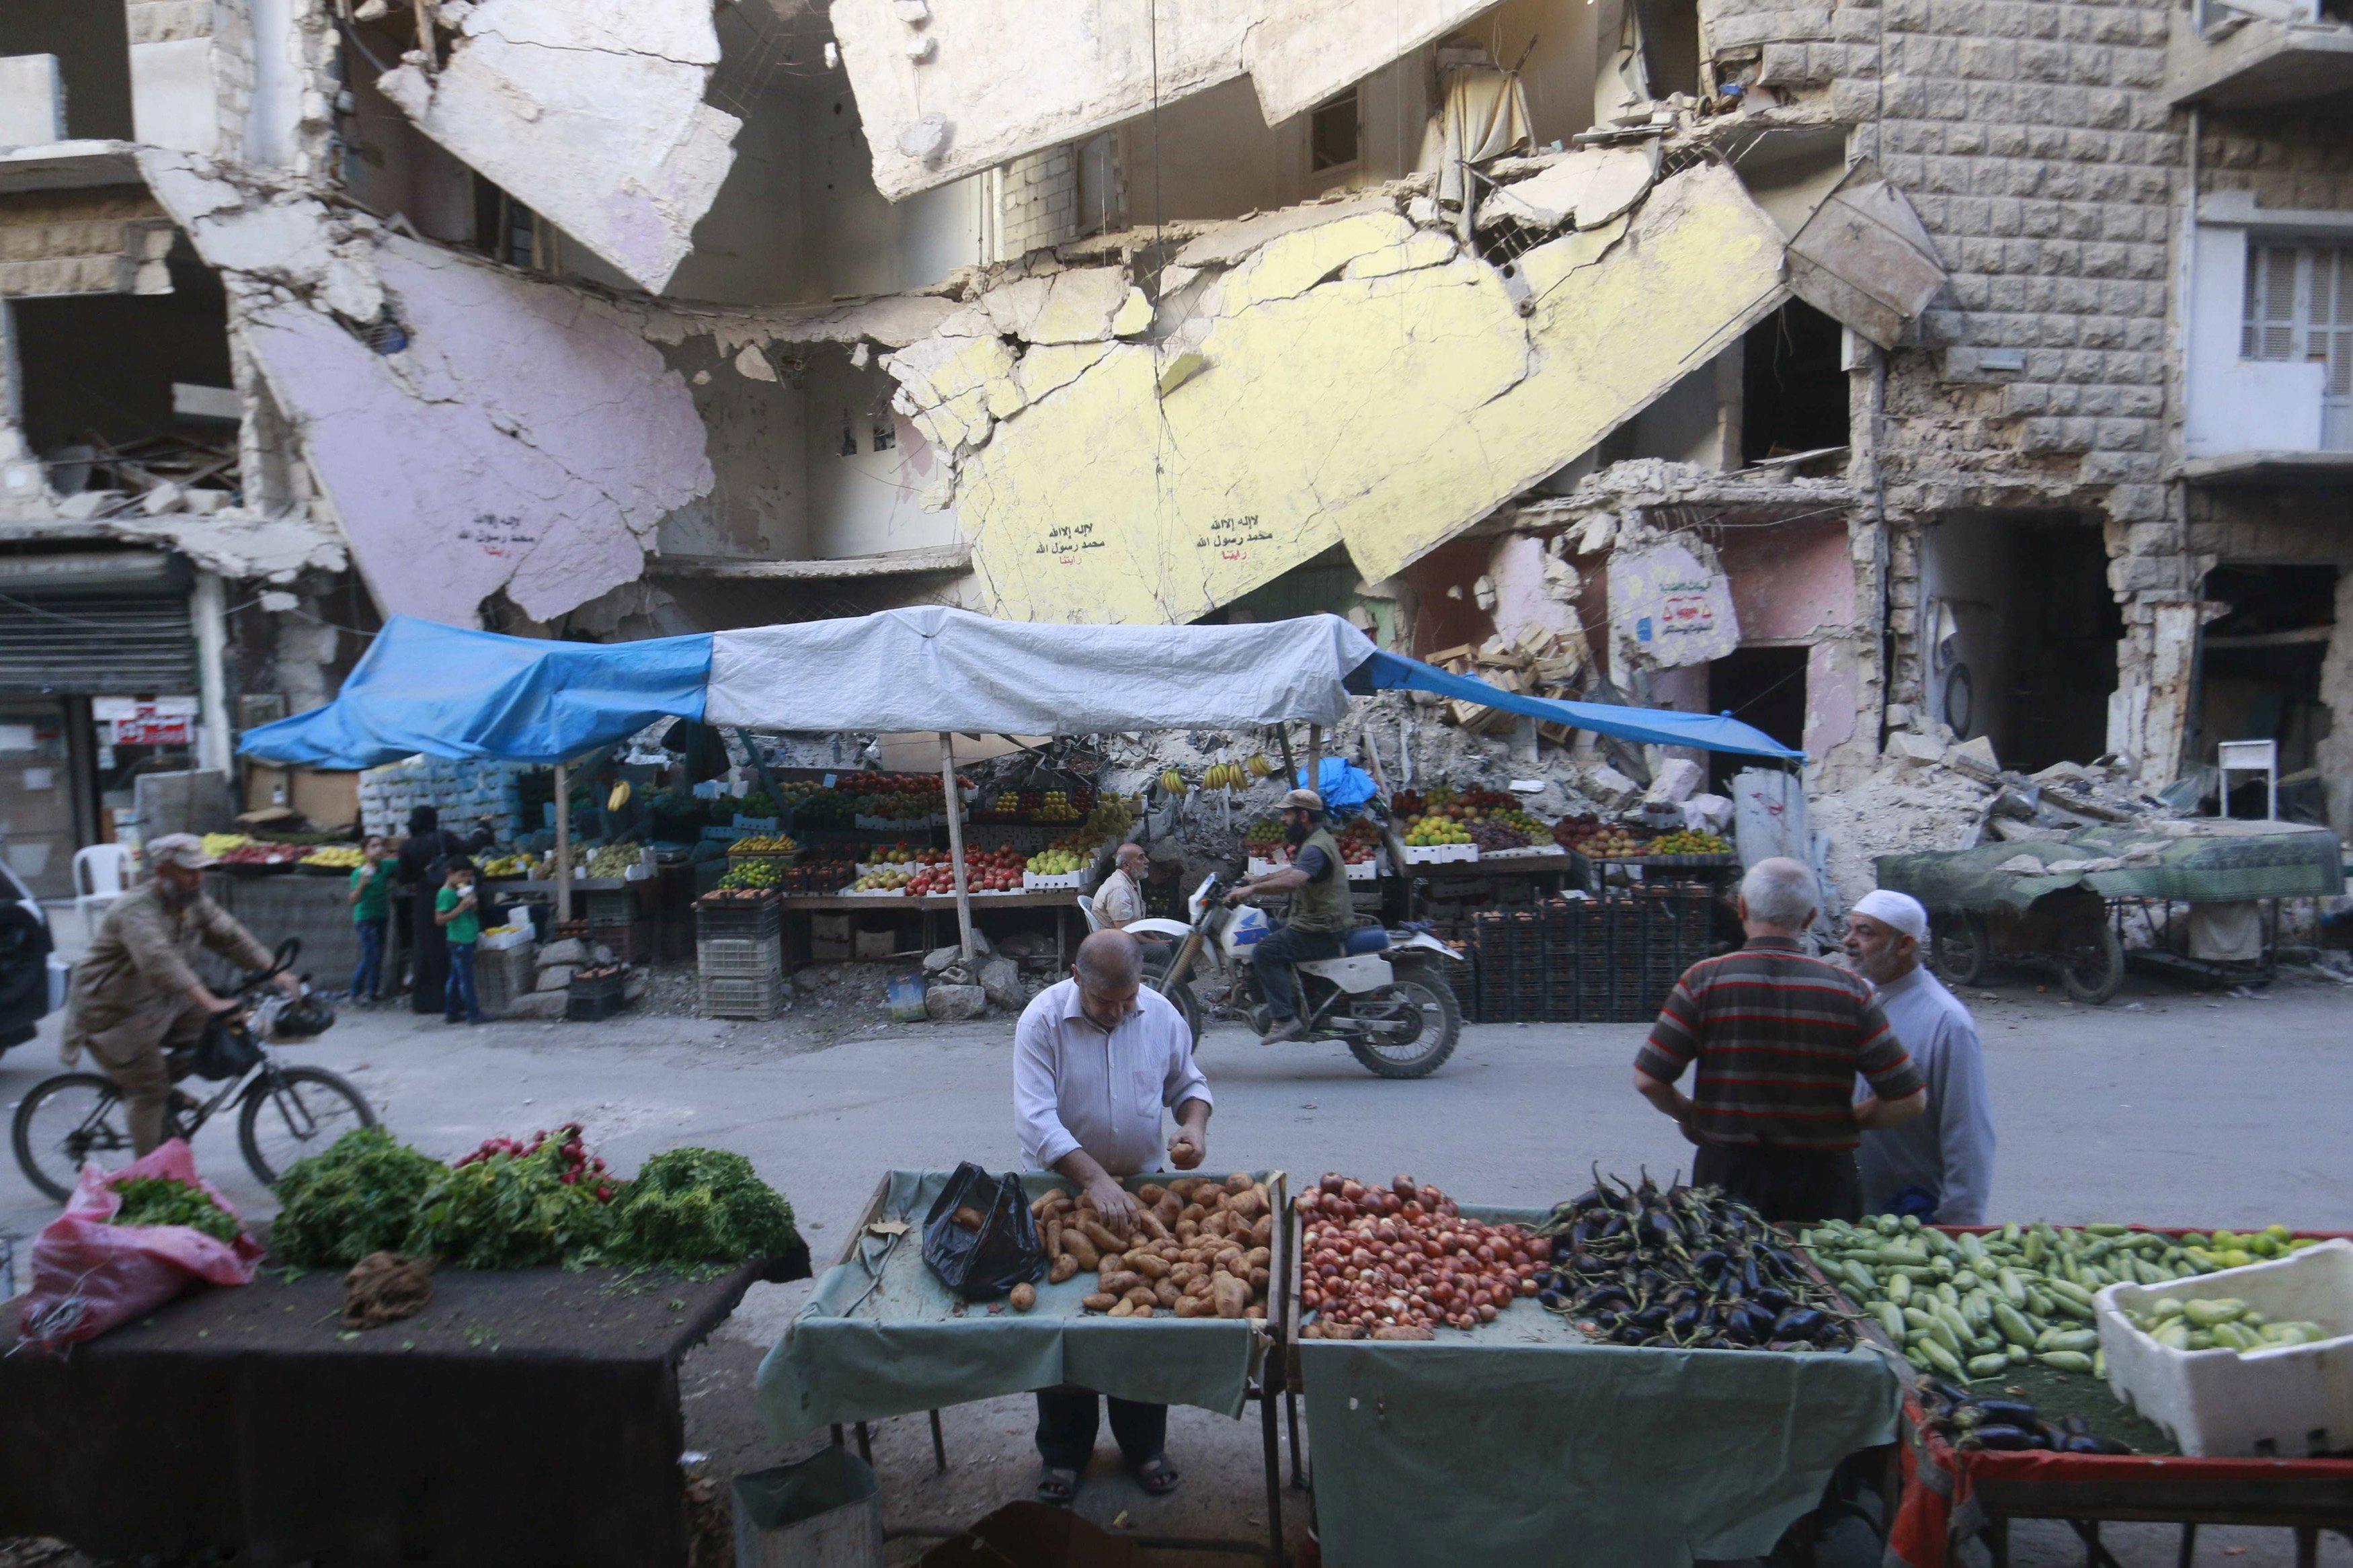 Warga berbelanja sayuran dan buah-buahan yang dijual di depan gedung rusak di wilayah Bustan al-Qasr, Aleppo, Suriah, Rabu (14/10). ANTARA FOTO/REUTERS/Hosam Katan.